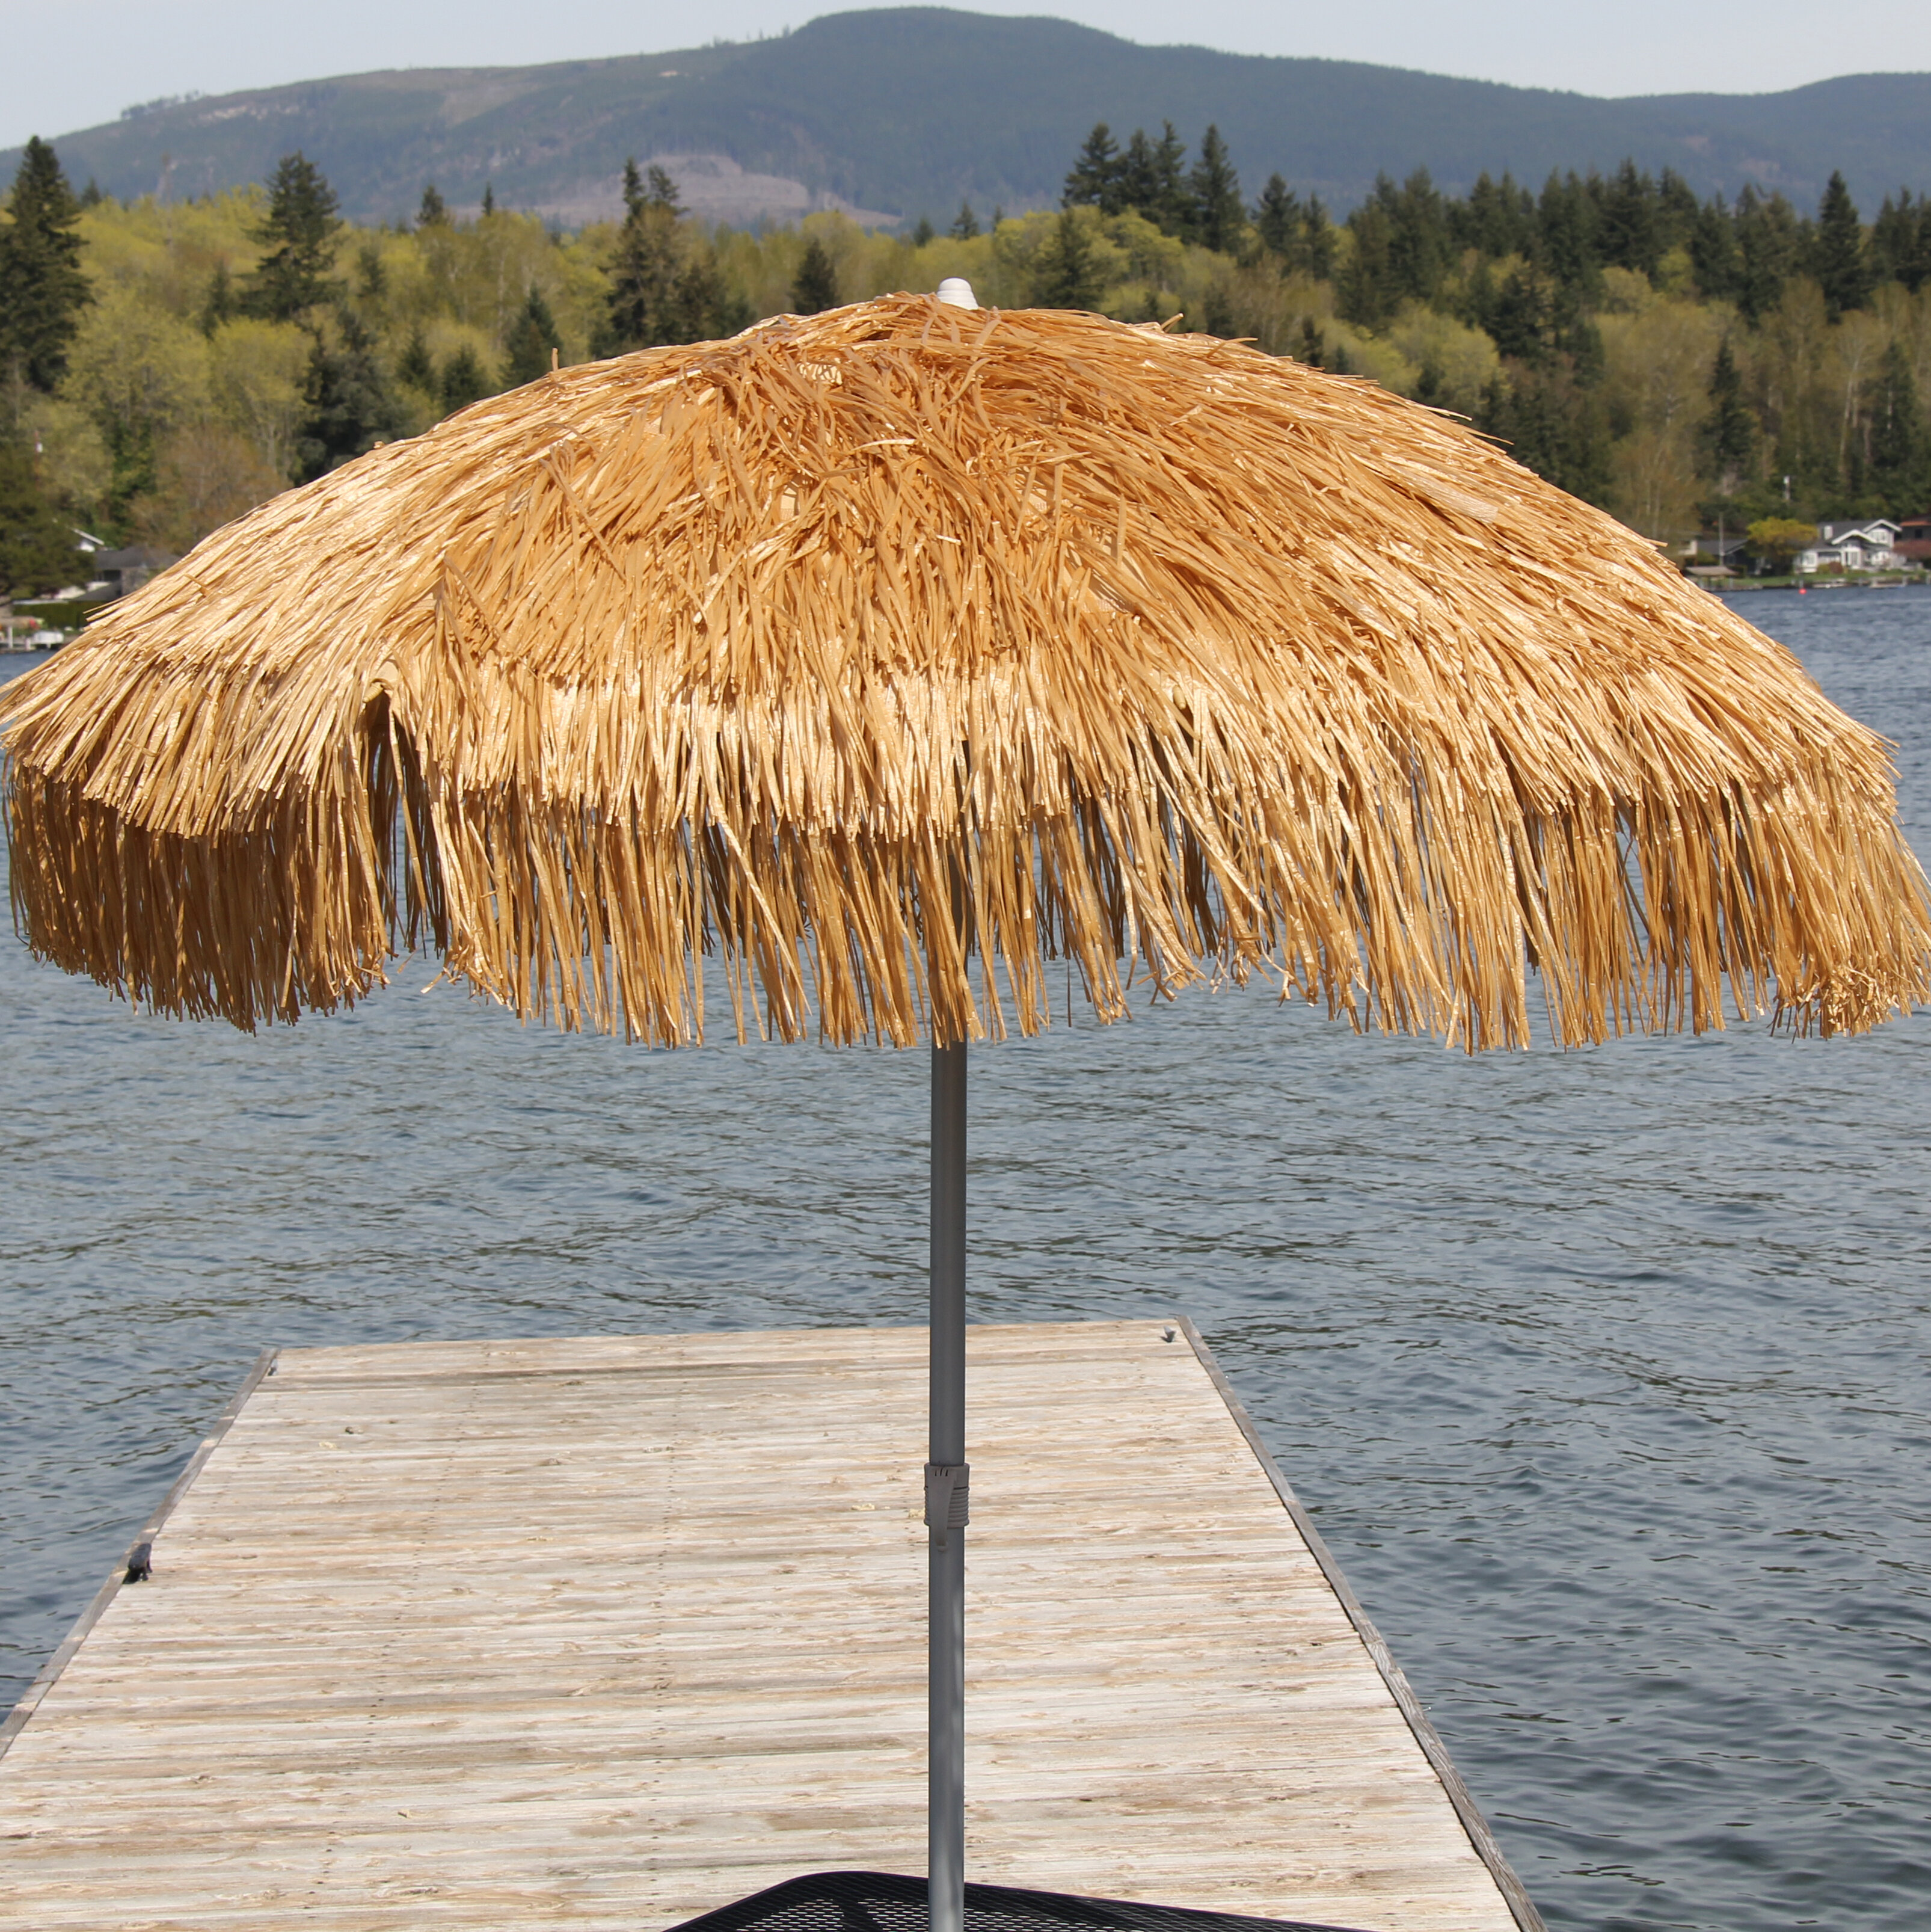 Parasol Palapa 6 Beach Umbrella